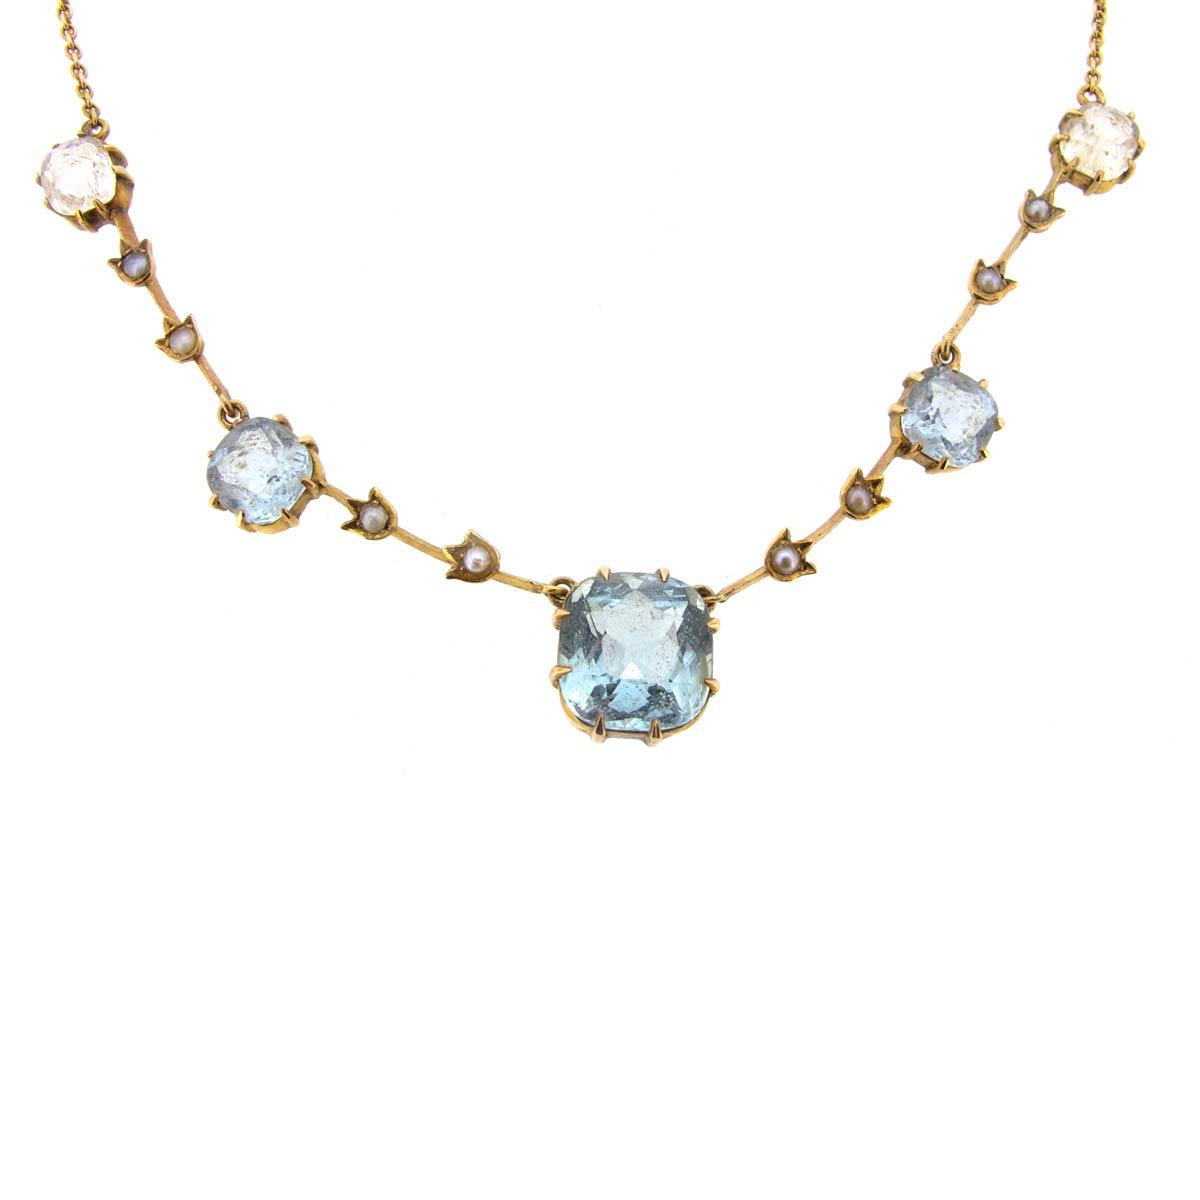 Edwardian Aquamarine, Pearl & Crystal Necklace